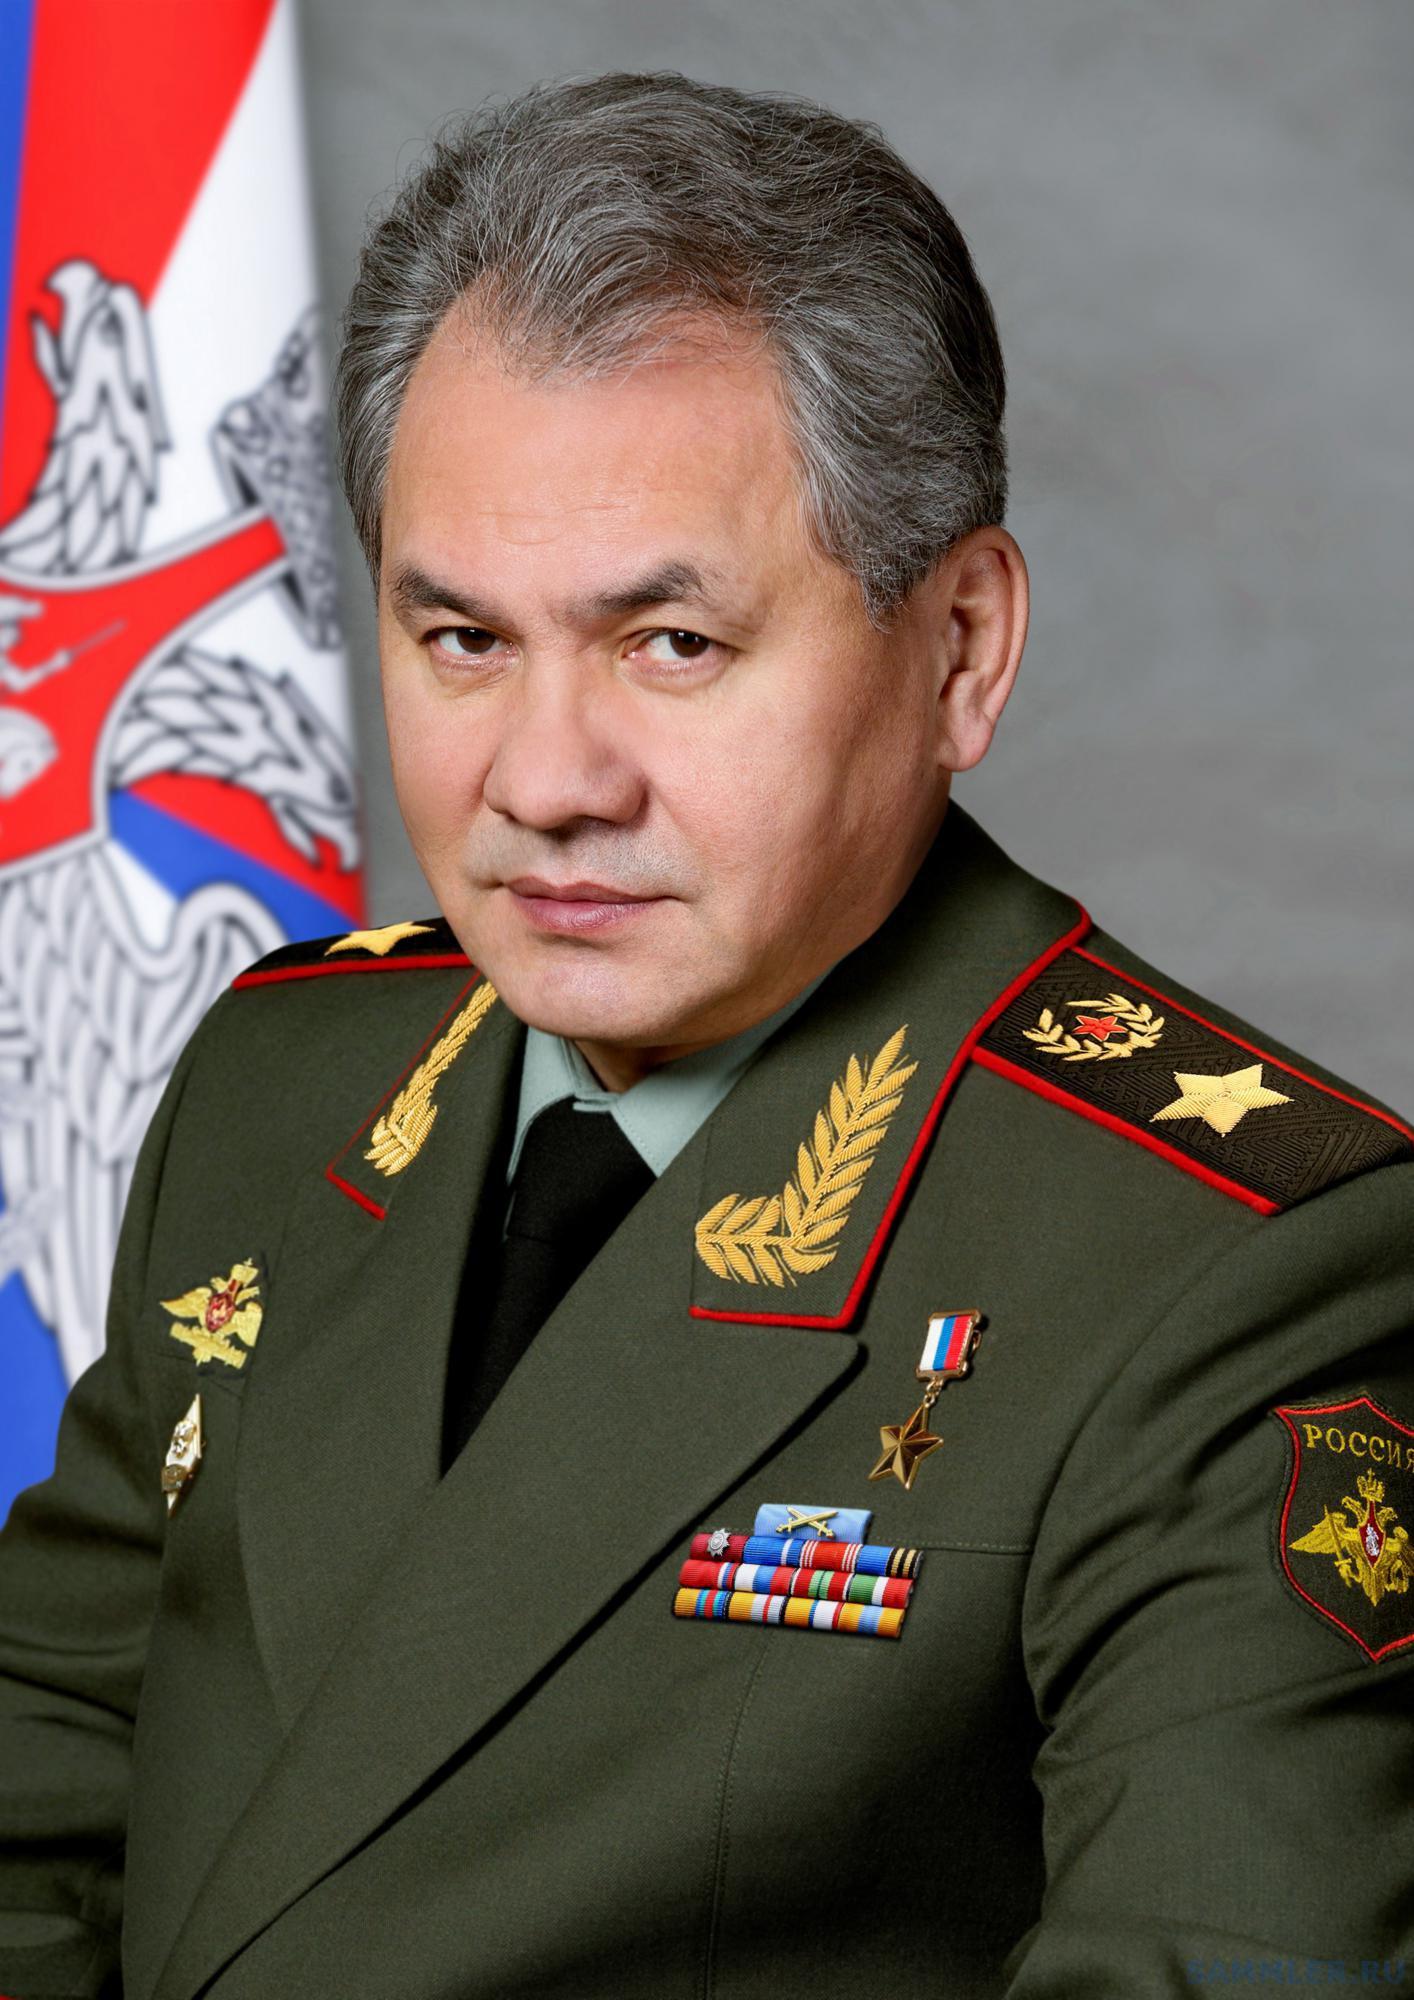 Шойгу Сергей Кожугетович - официальное фото 2014 - 1.jpg